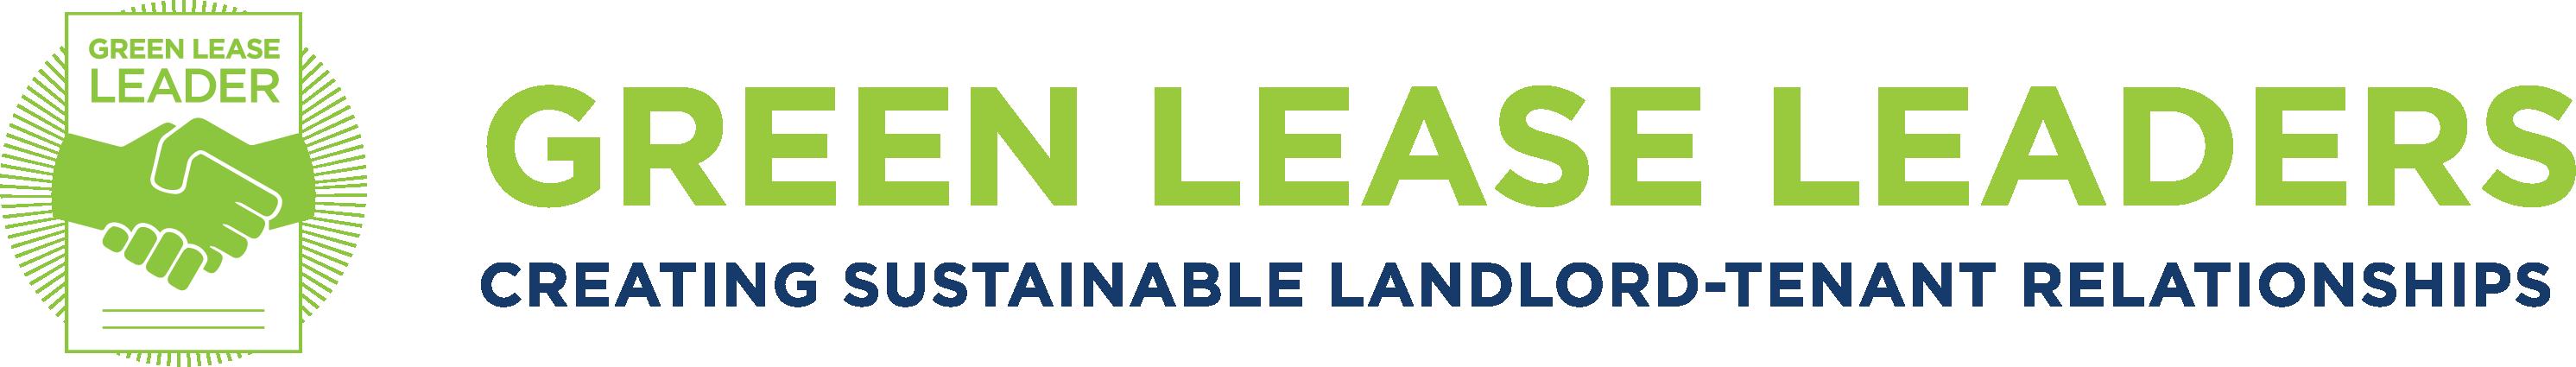 Green Lease Leaders logo